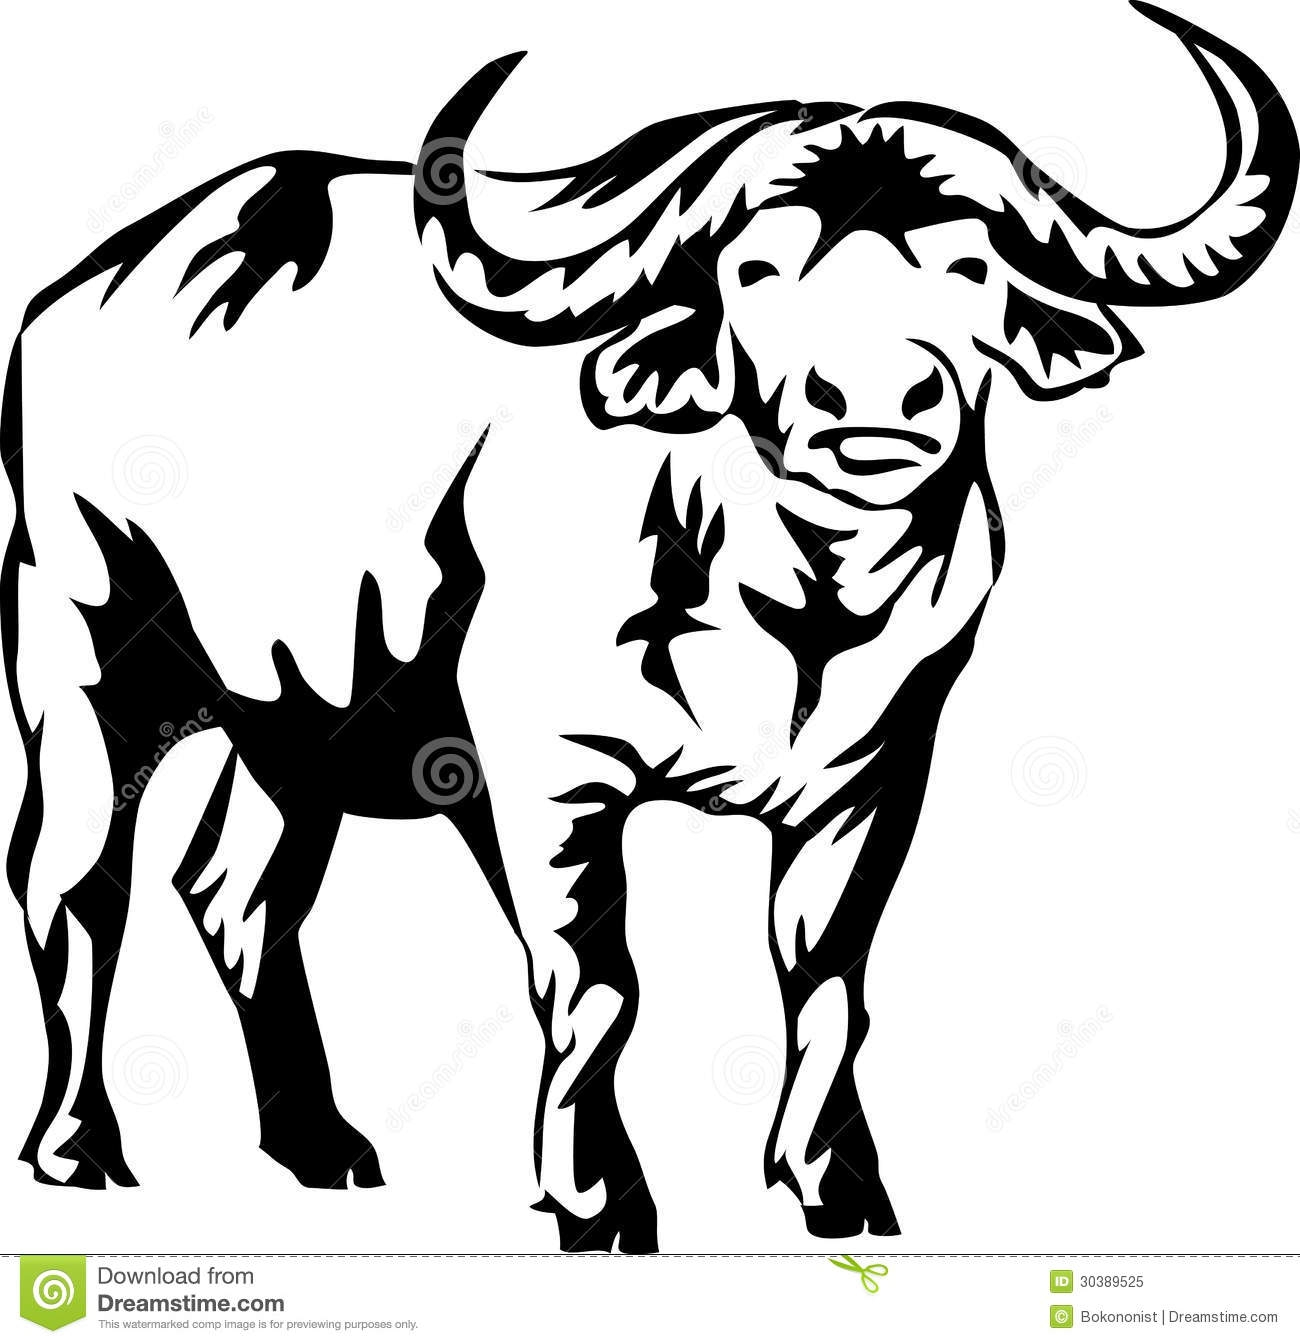 Buffalo clipart simple. Fresh collection digital i